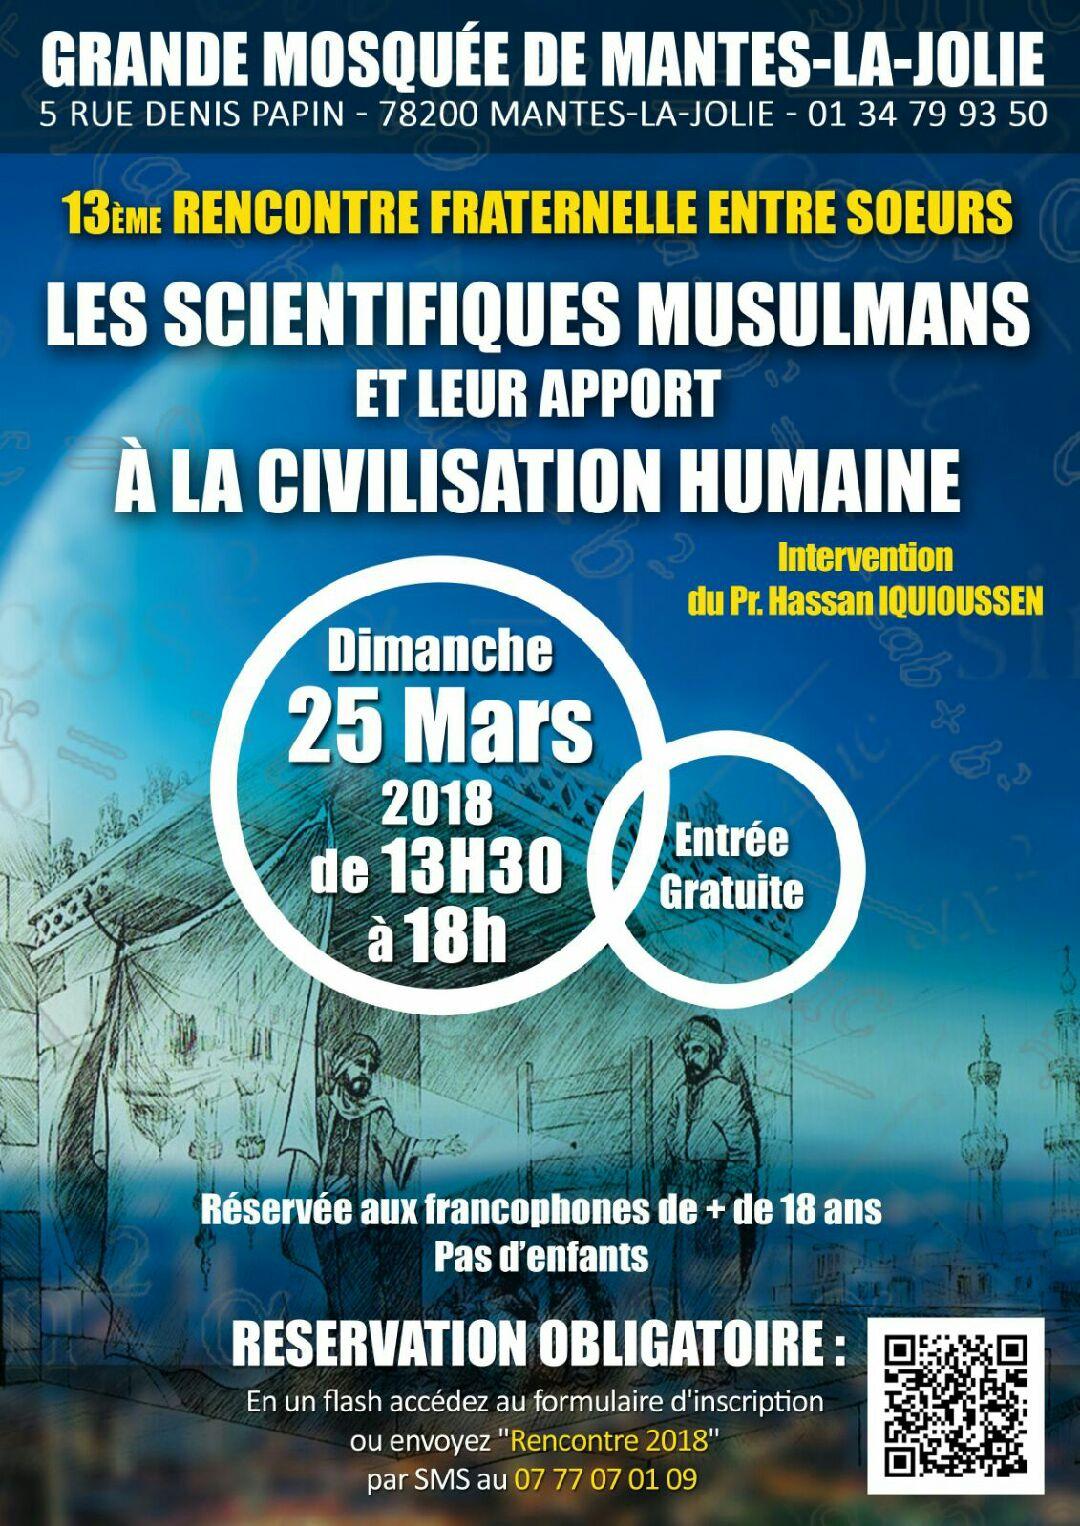 https://www.saphirnews.com/agenda/13e-Rencontre-fraternelle-entre-soeurs_ae567838.html